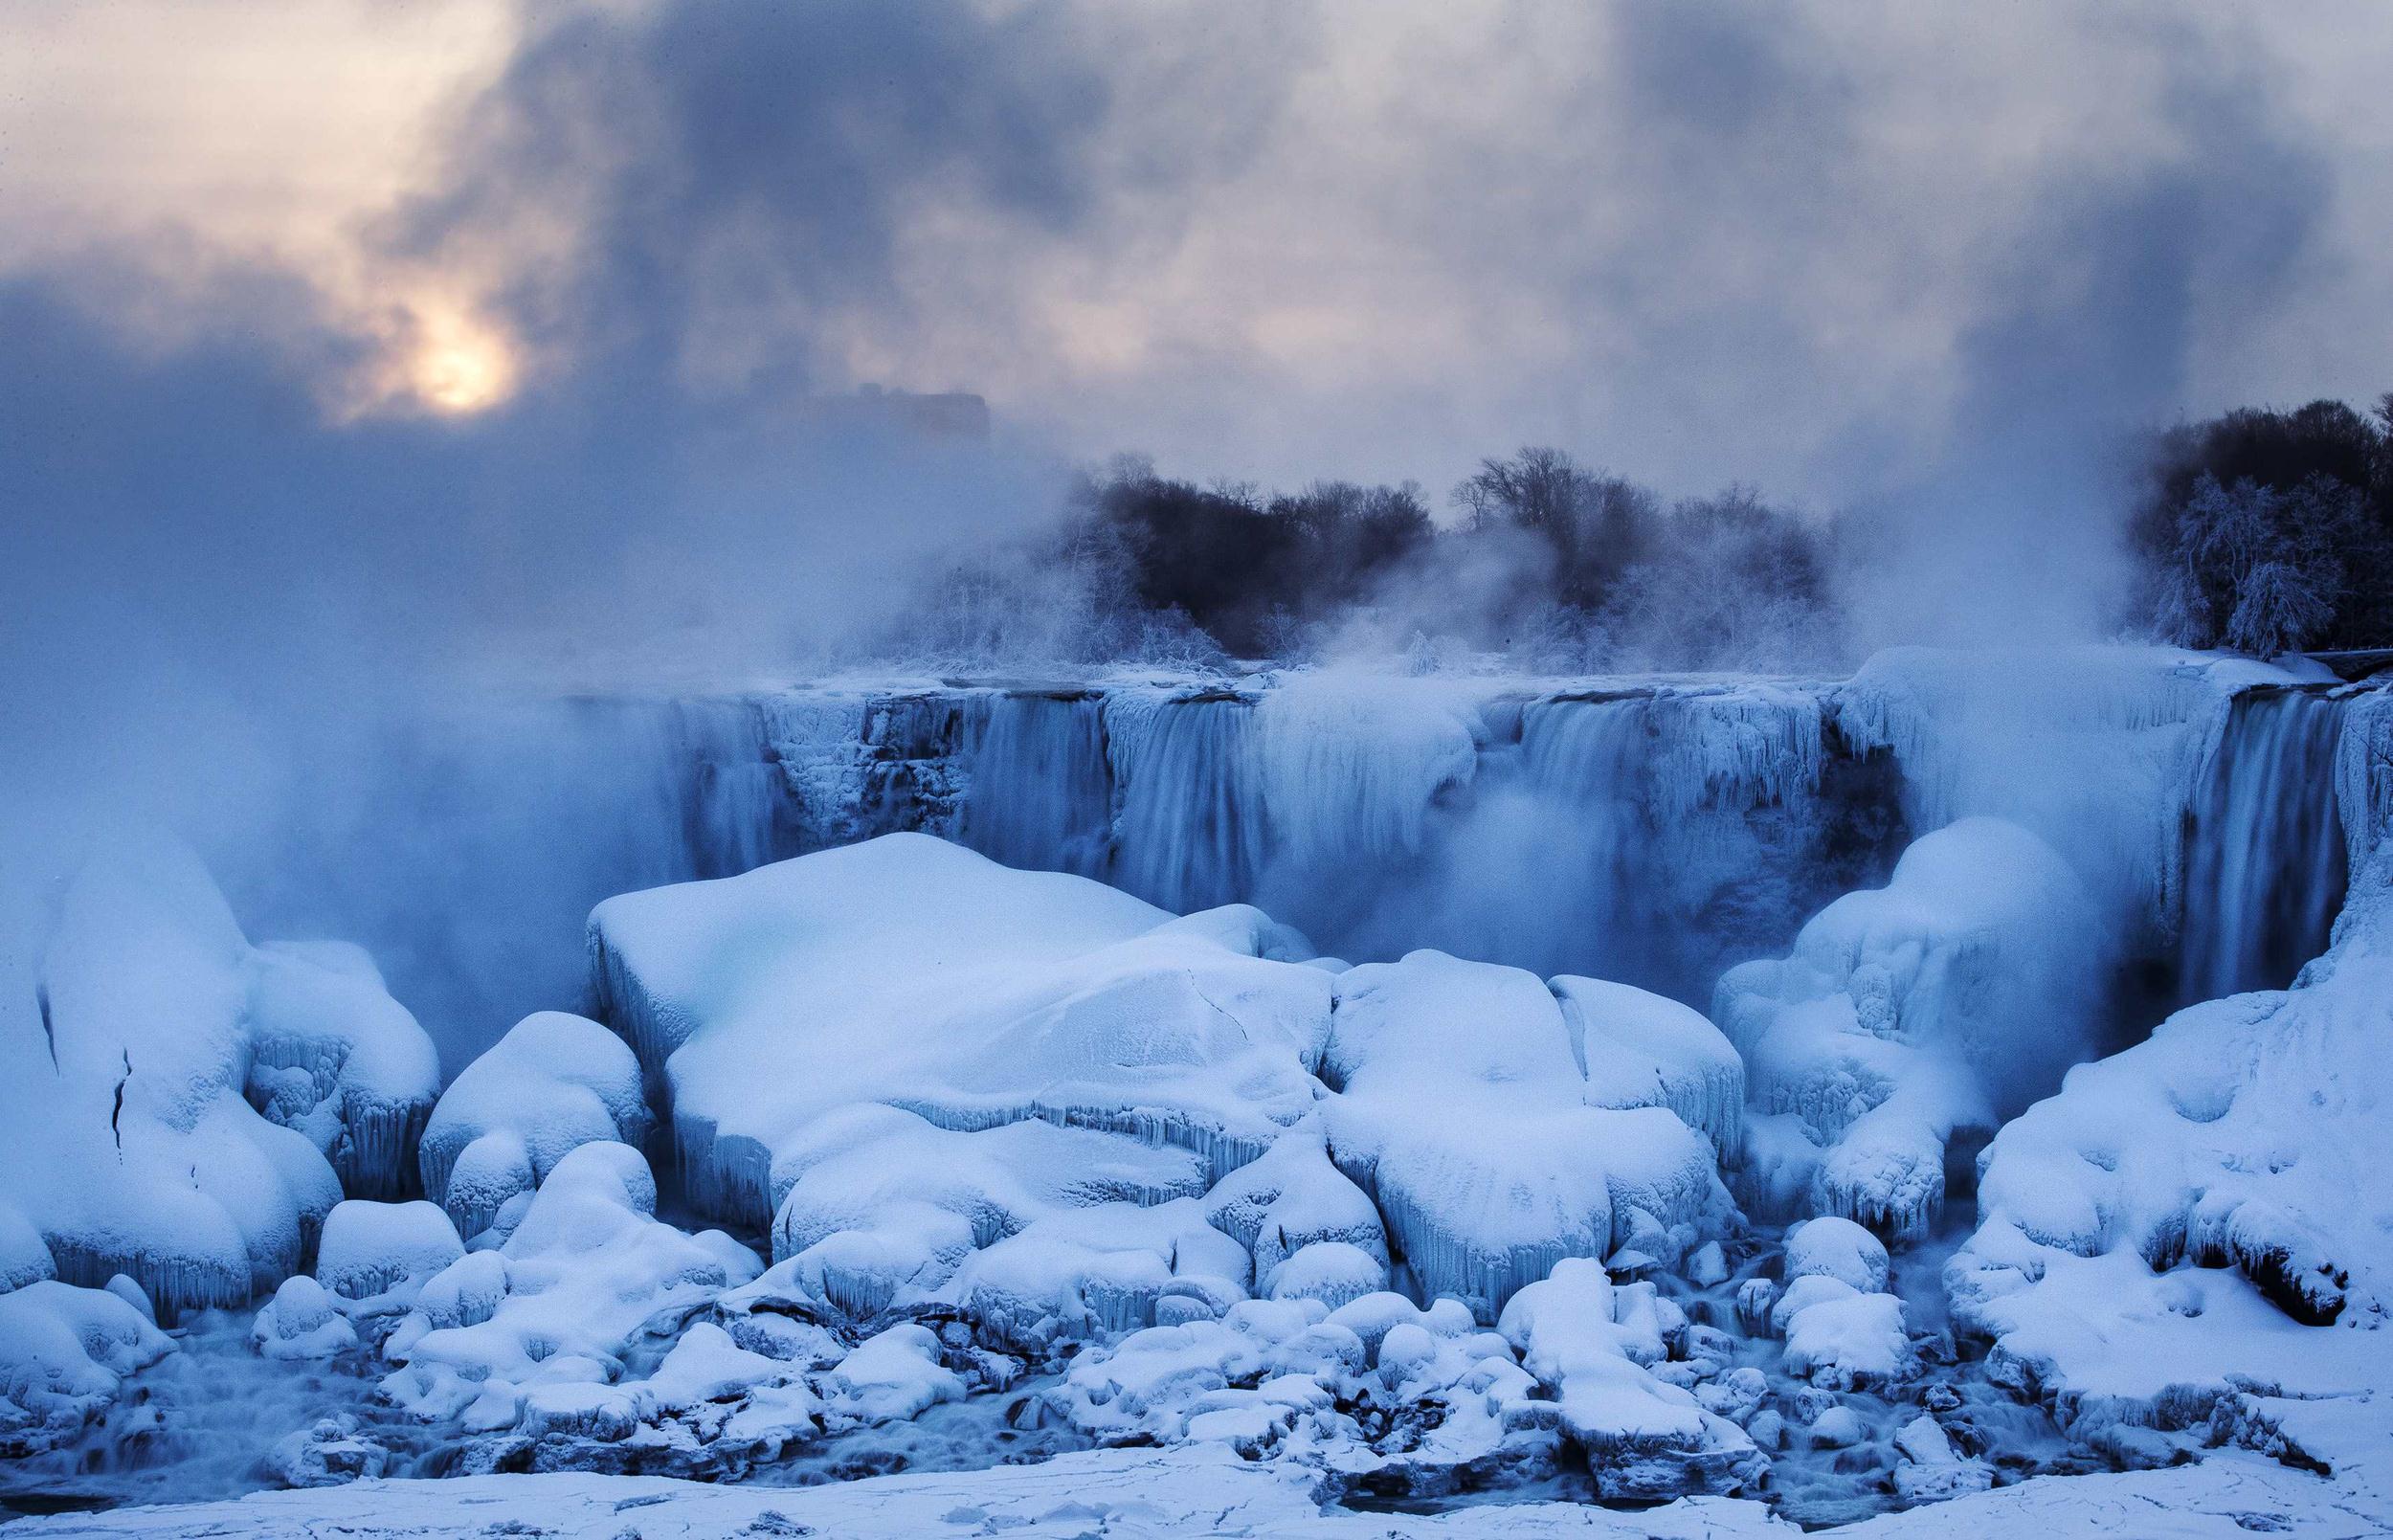 Niagara Falls Stuns in Sub-Freezing Temps - NBC News